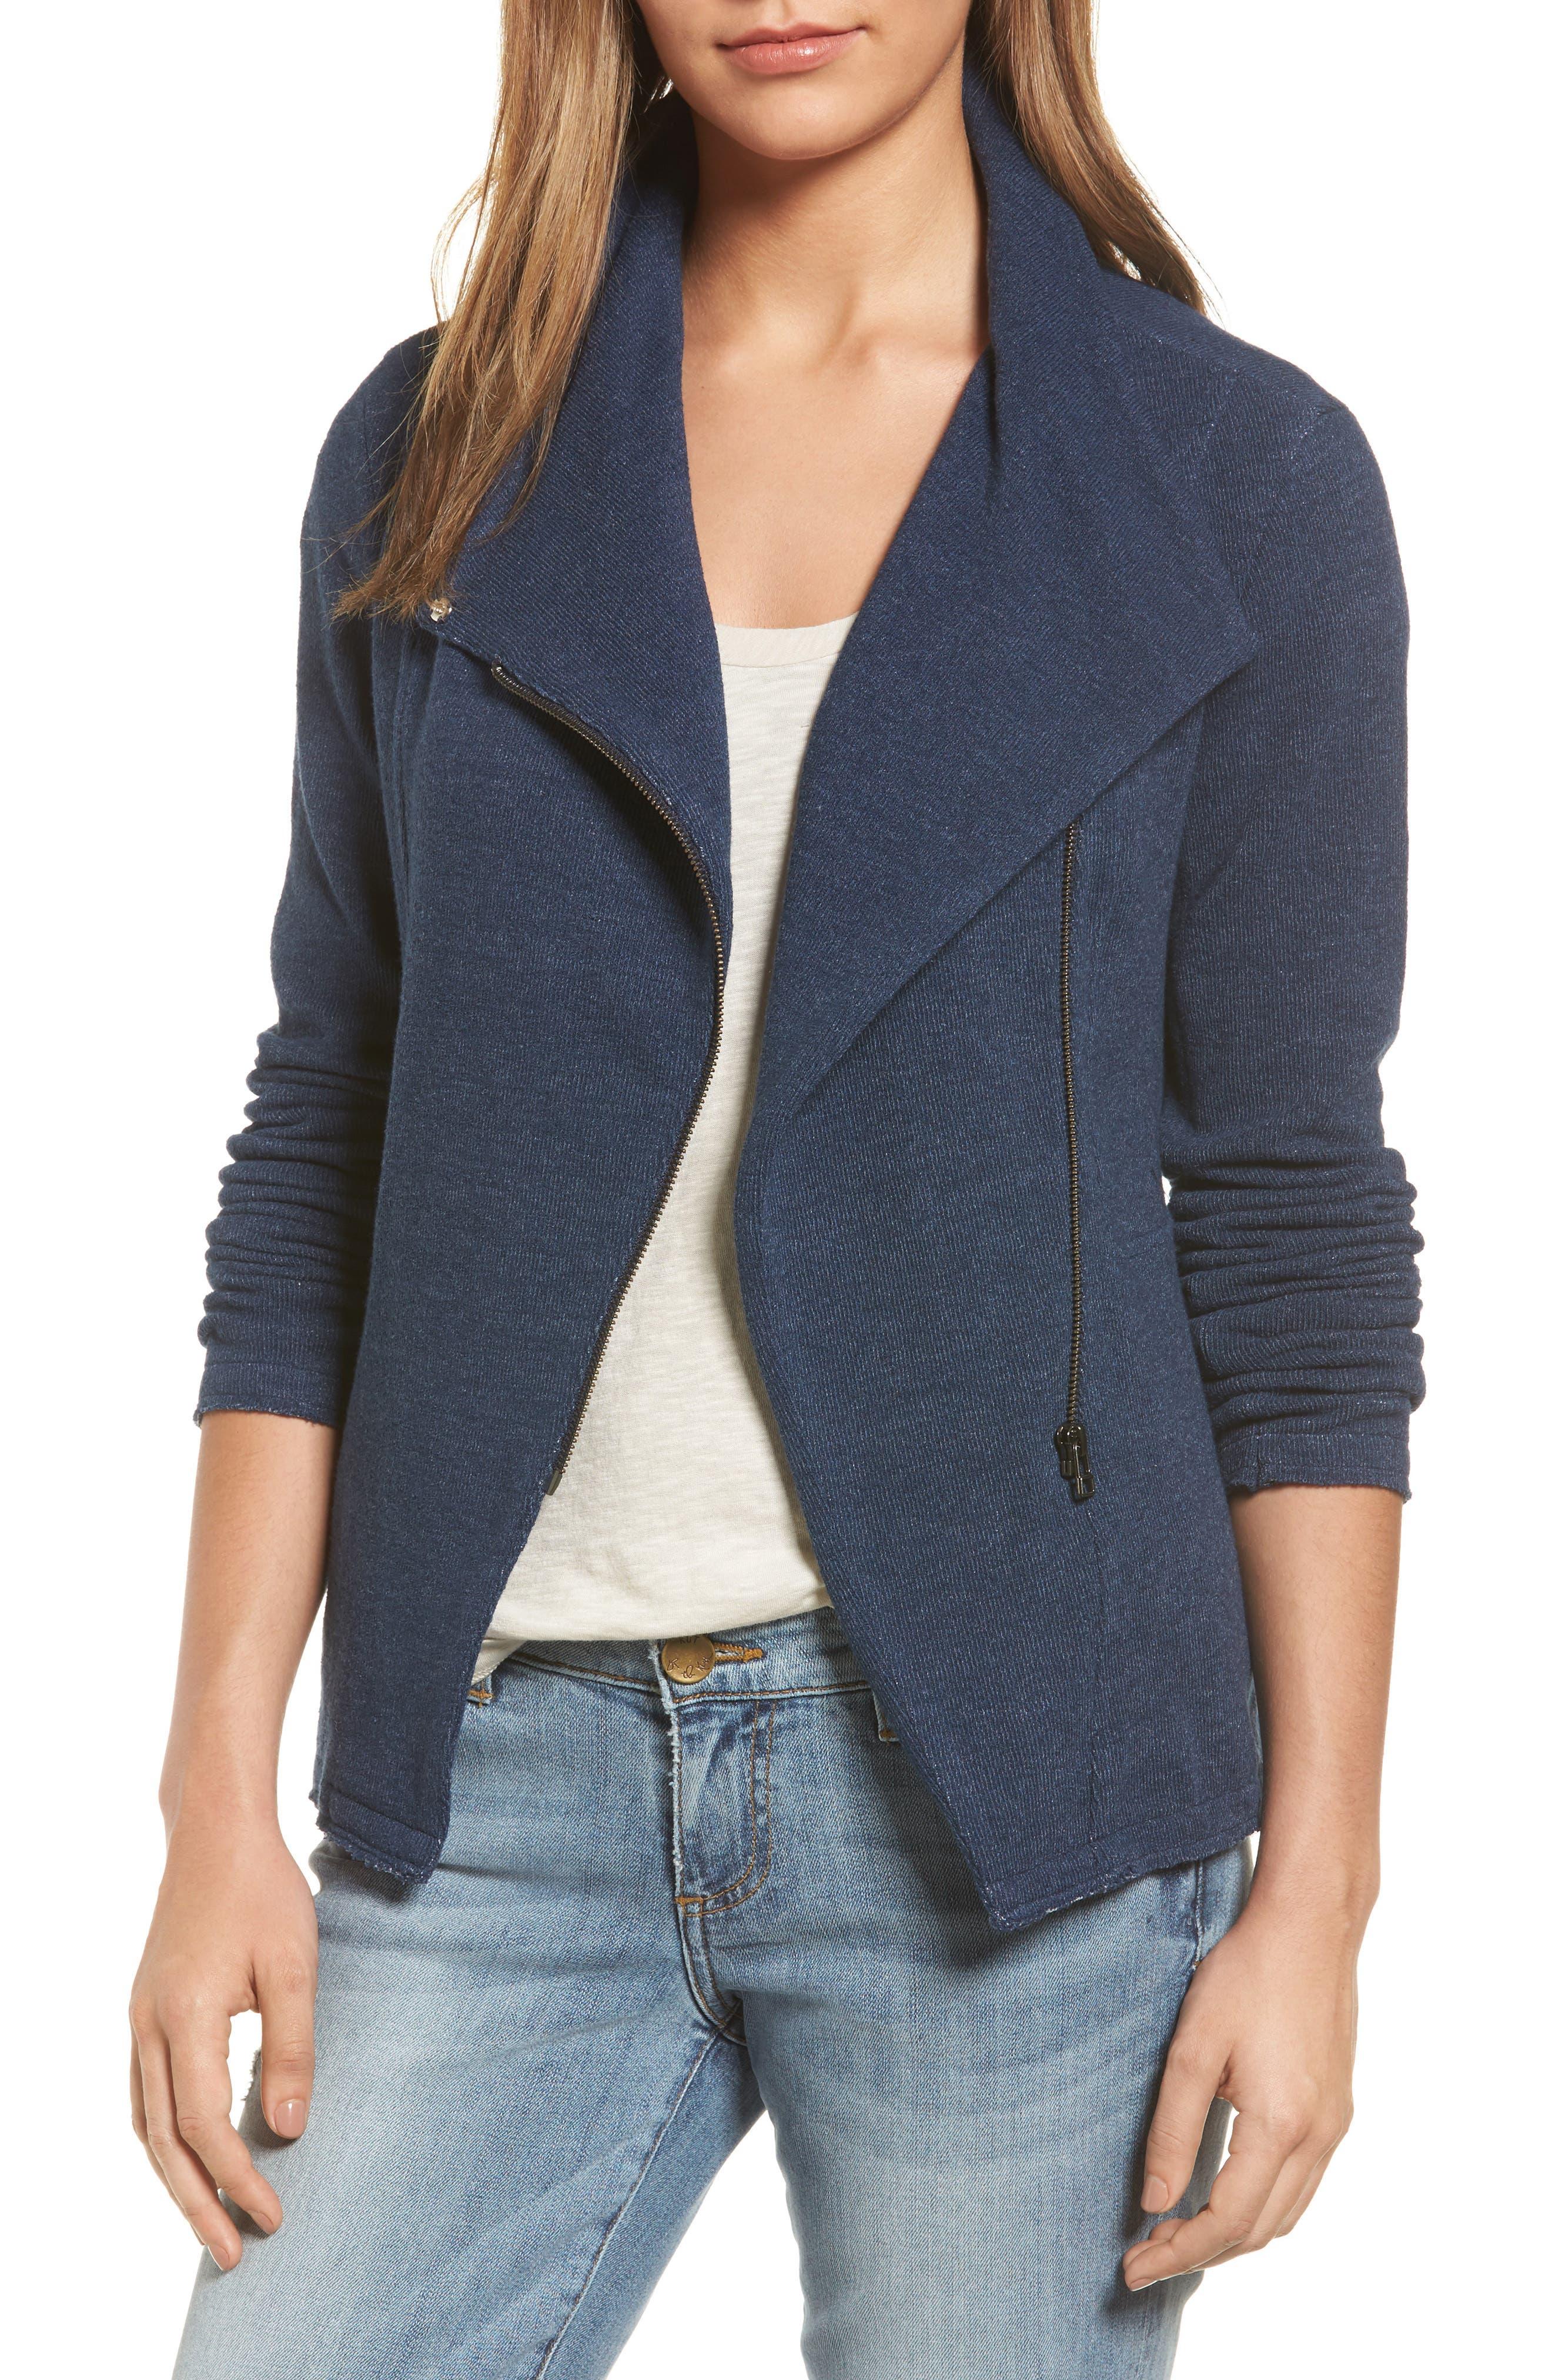 Alternate Image 1 Selected - Caslon® Knit Moto Jacket (Regular & Petite)